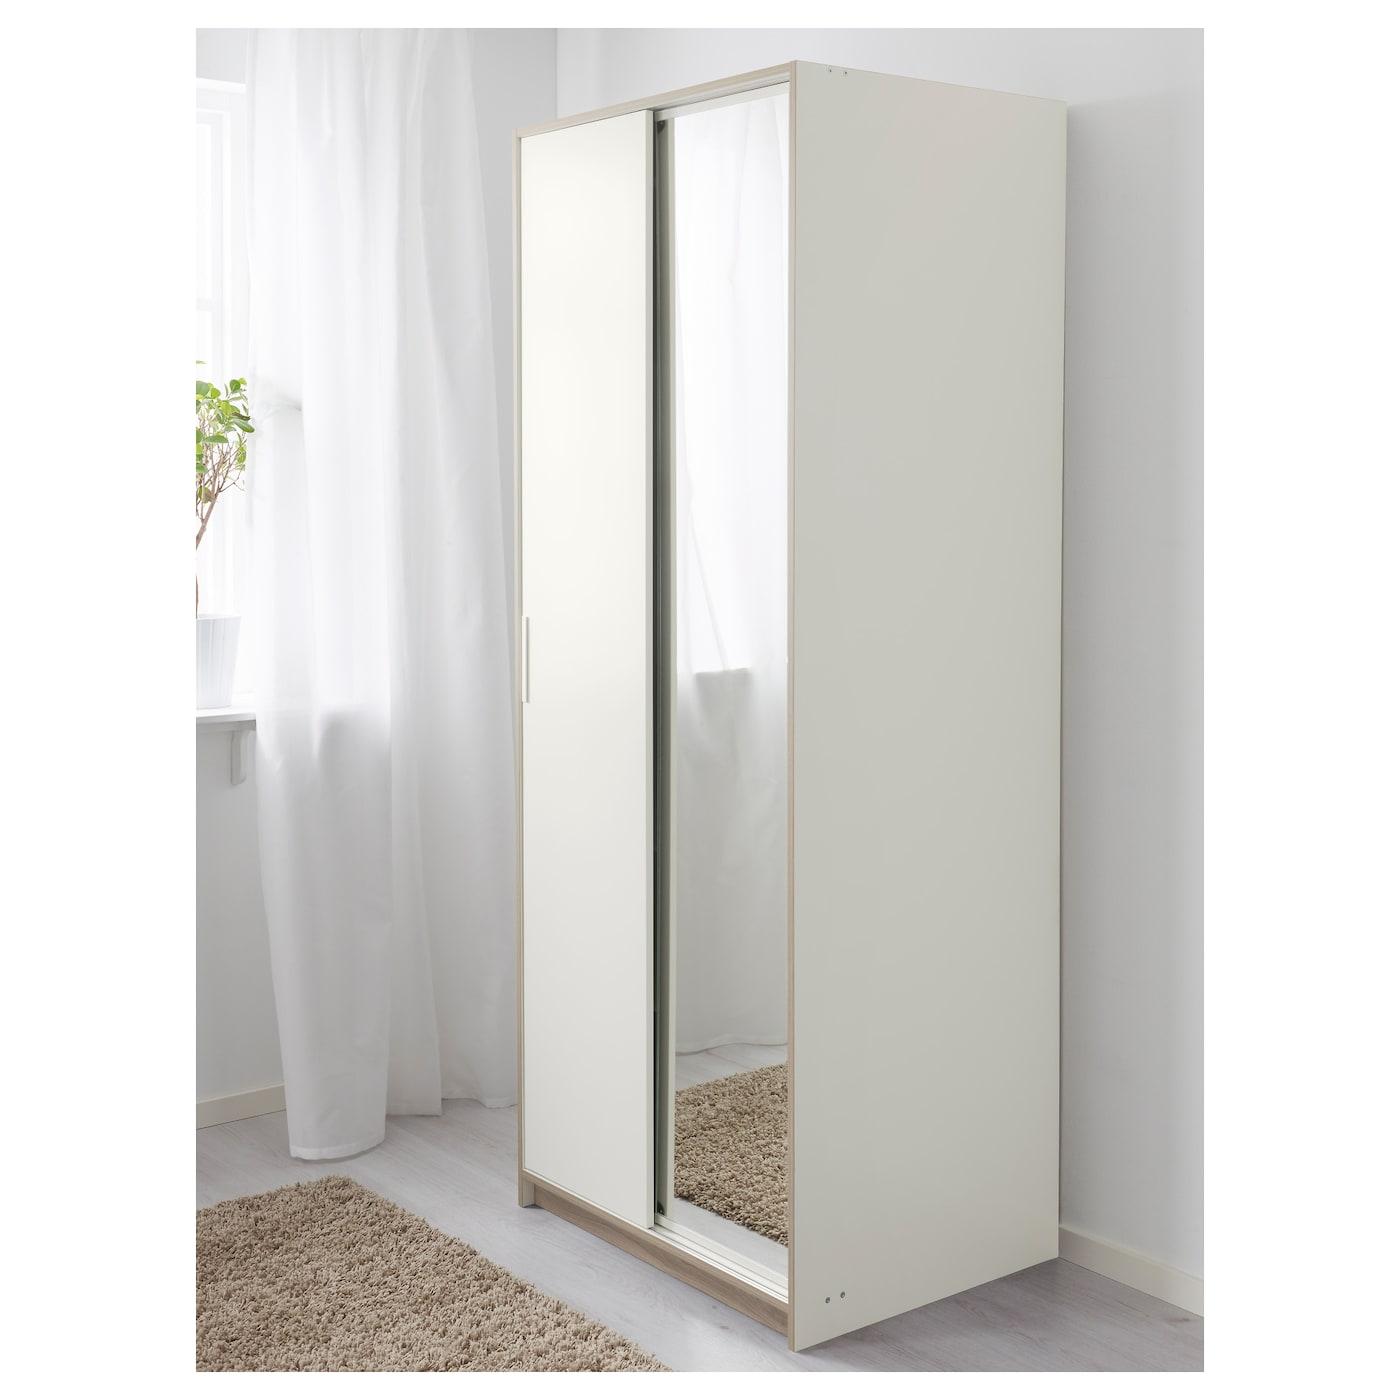 trysil armoire penderie blanc miroir 79x61x202 cm ikea. Black Bedroom Furniture Sets. Home Design Ideas